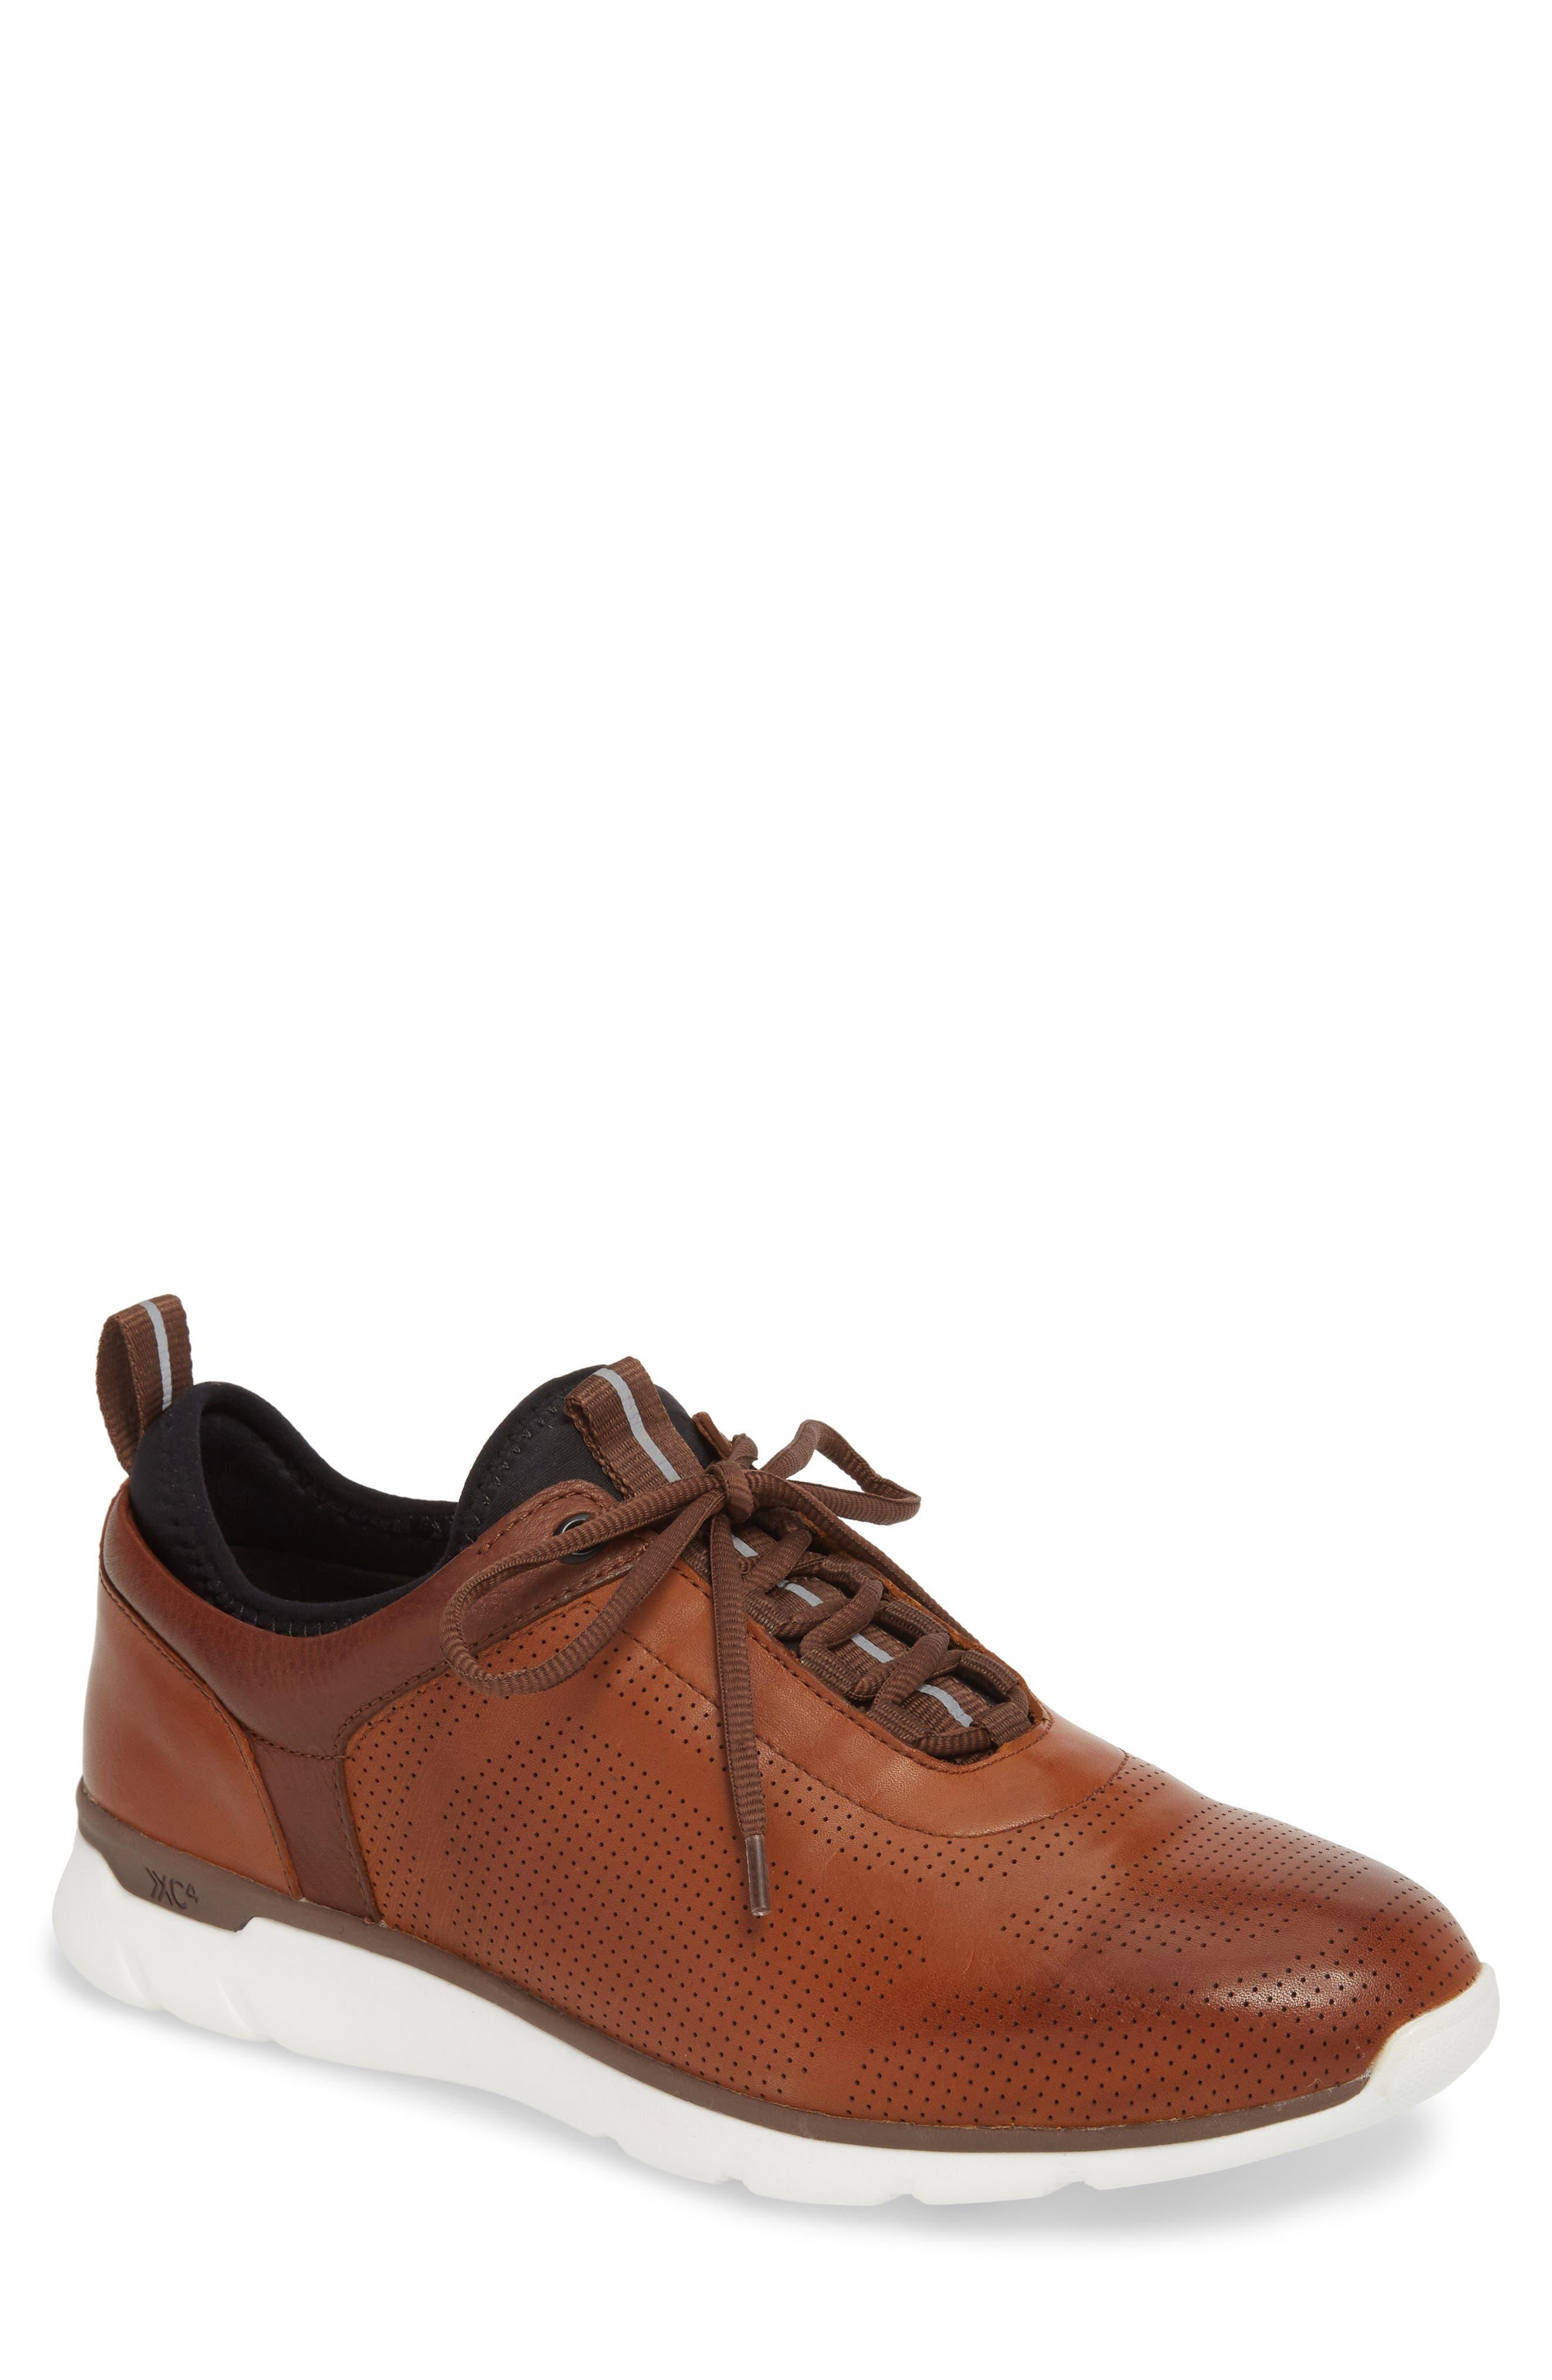 JOHNSTON & MURPHY, Prentiss XC4<sup>®</sup> Waterproof Sneaker, Main thumbnail 1, color, MAHOGANY LEATHER